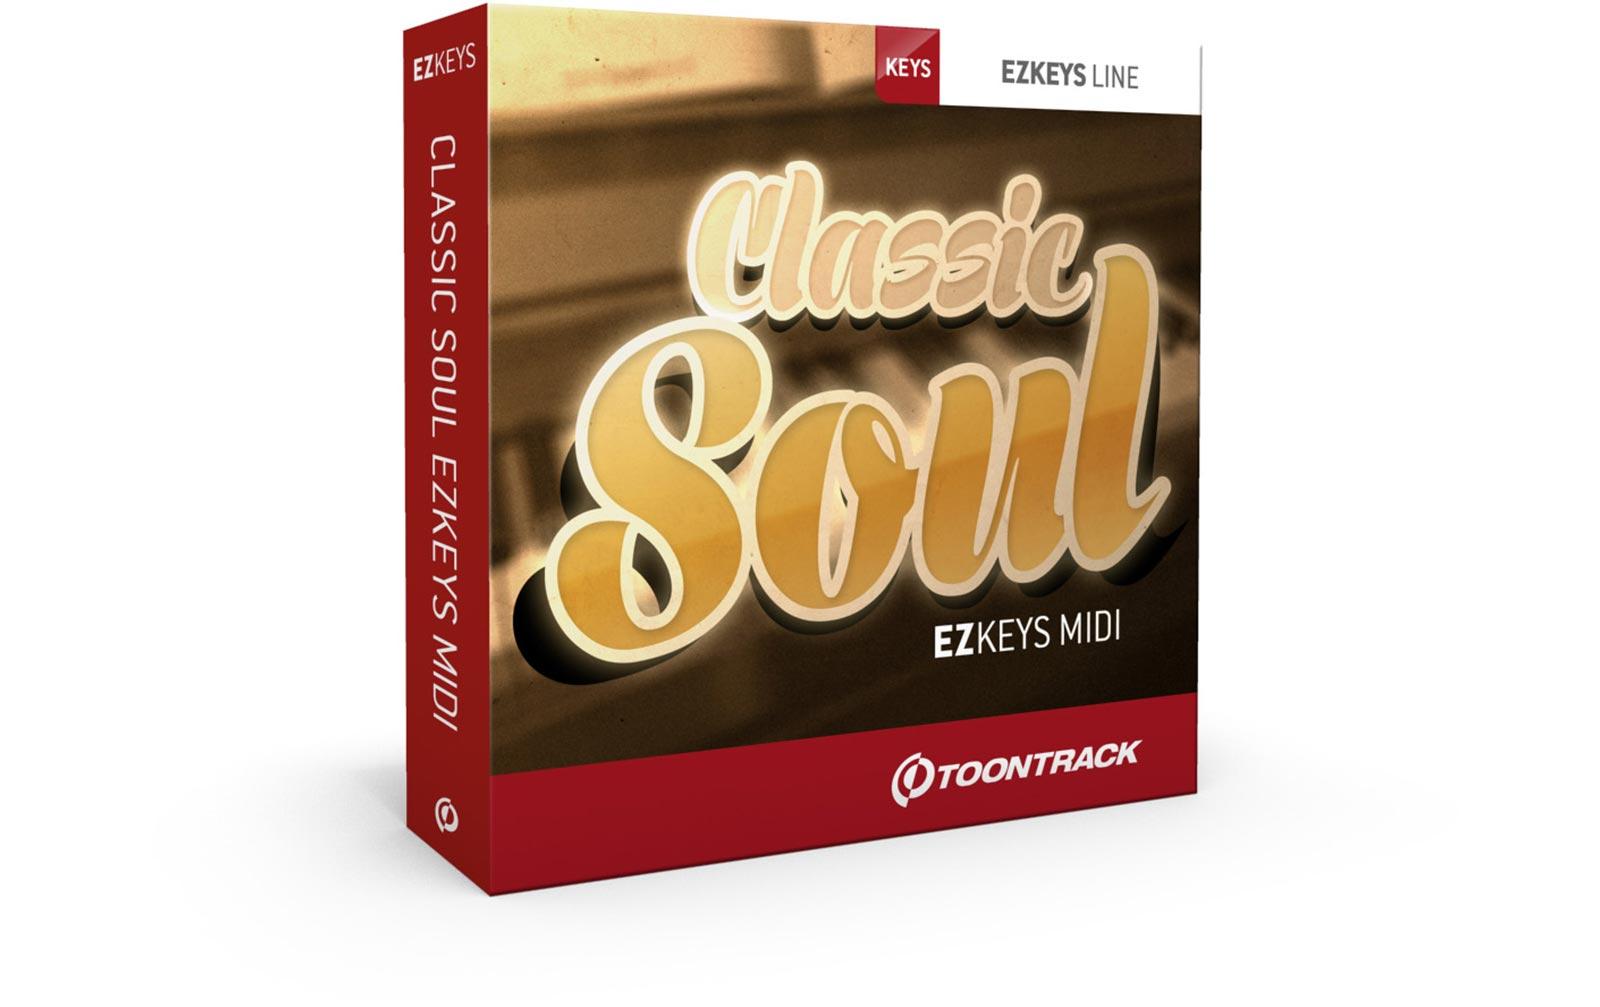 toontrack-ezkeys-classic-soul-midi-pack-download-